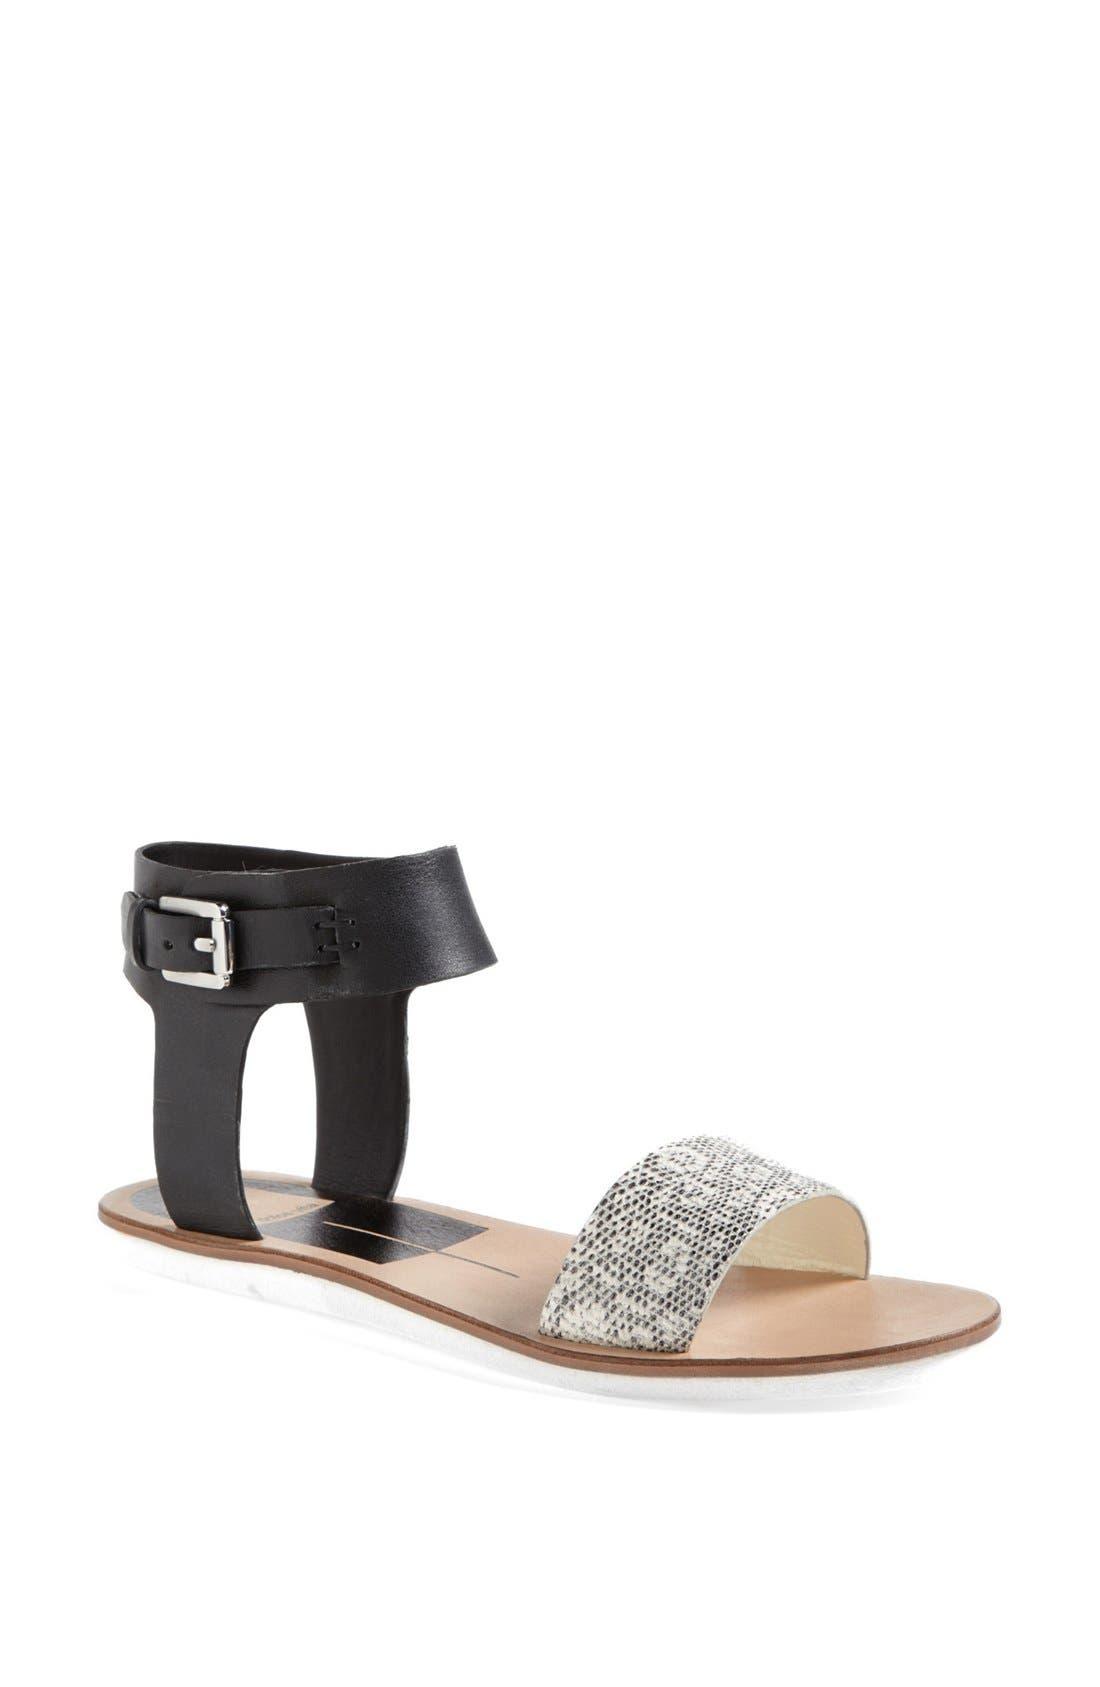 Alternate Image 1 Selected - Dolce Vita 'Naria' Sandal